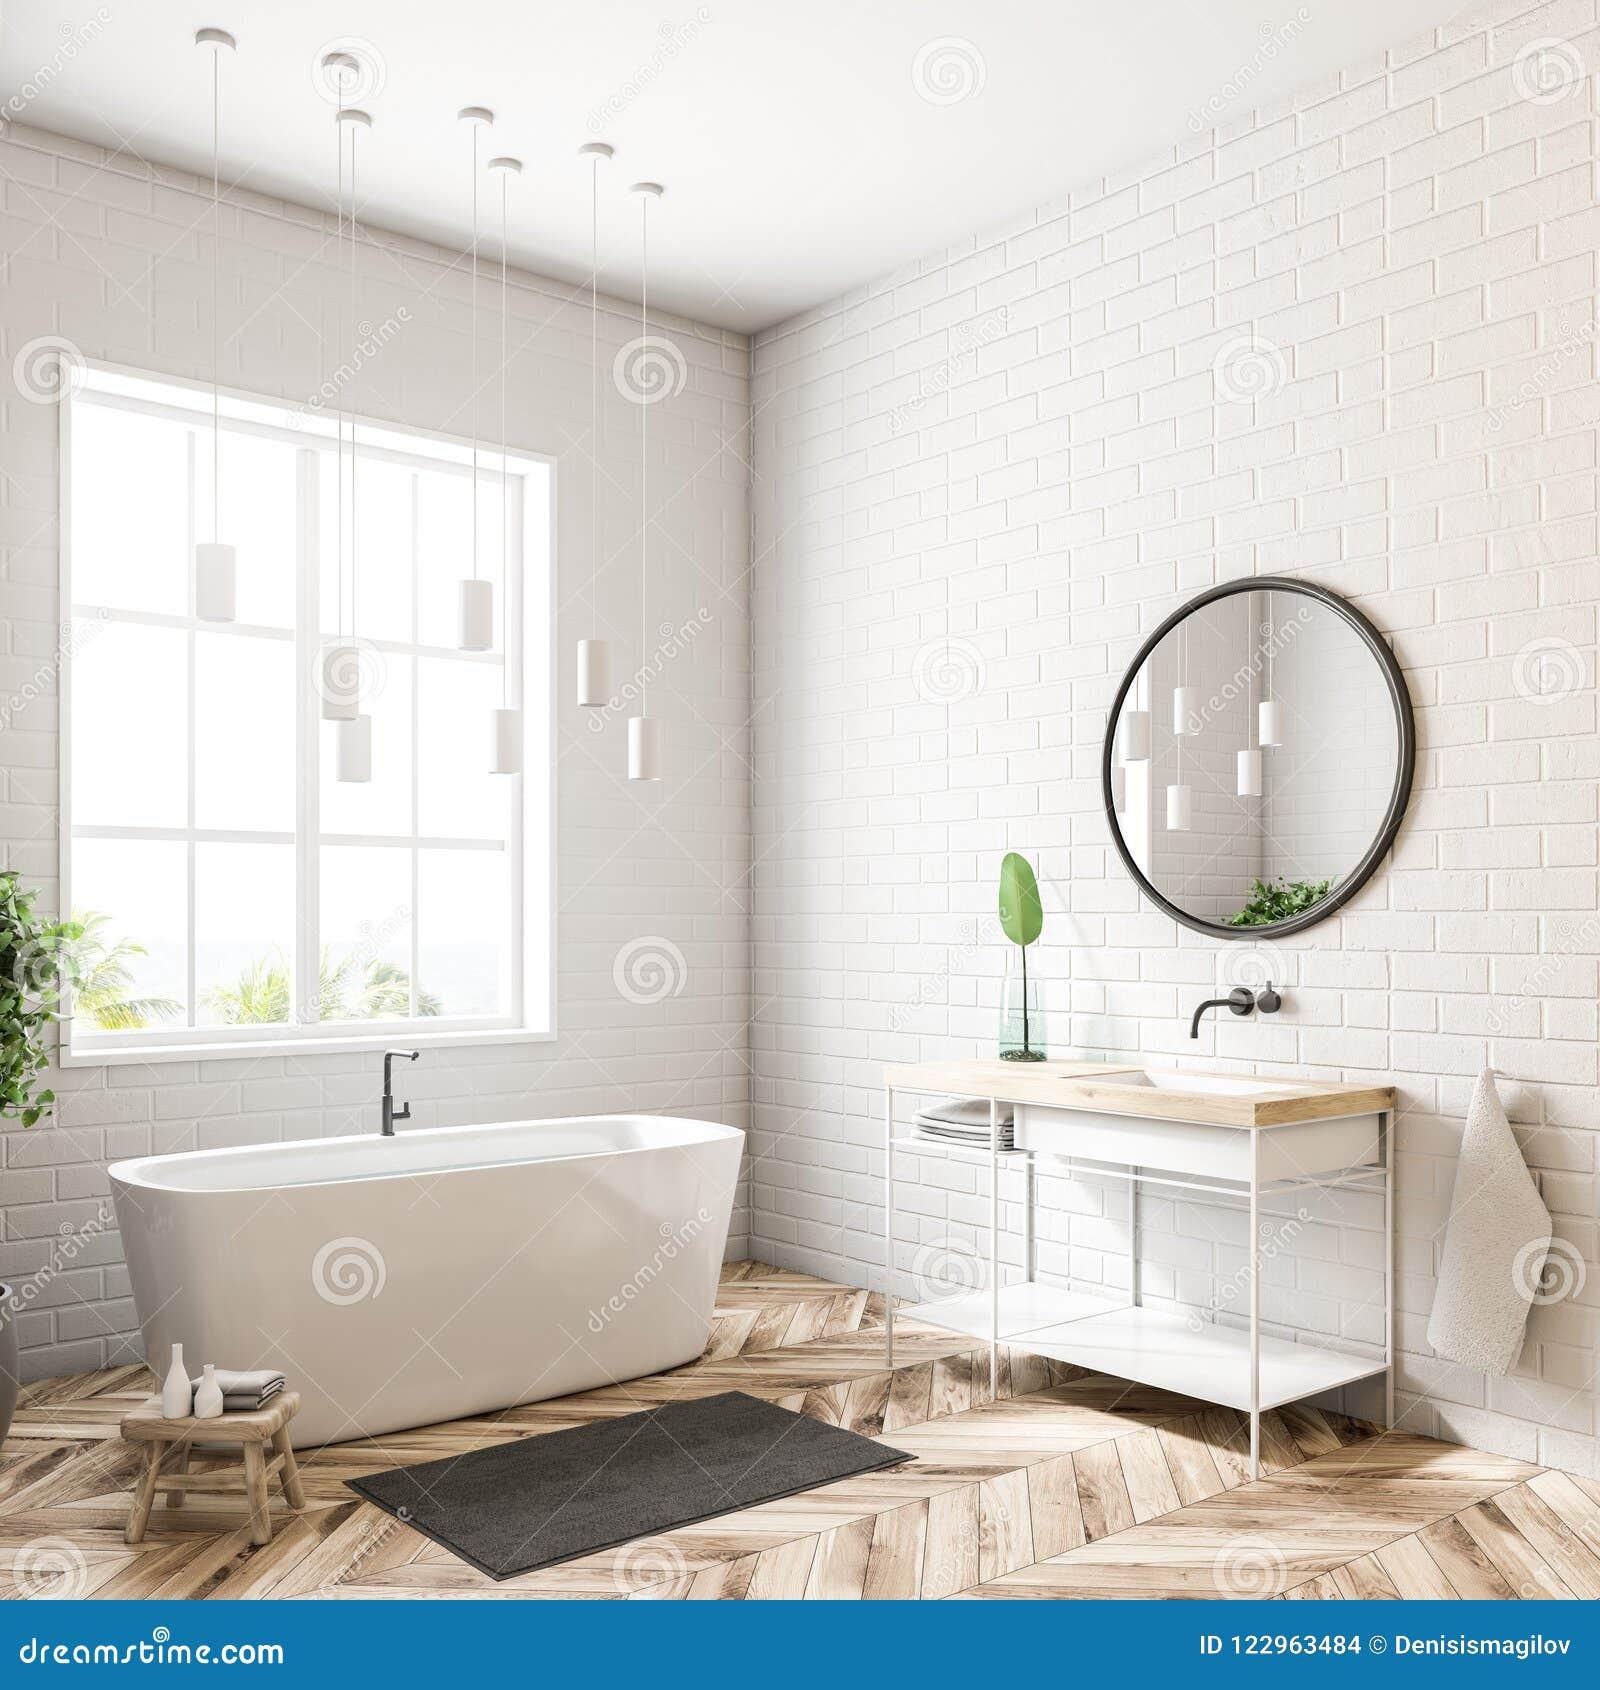 White Bathroom Corner, Mirror Stock Illustration - Illustration of ...